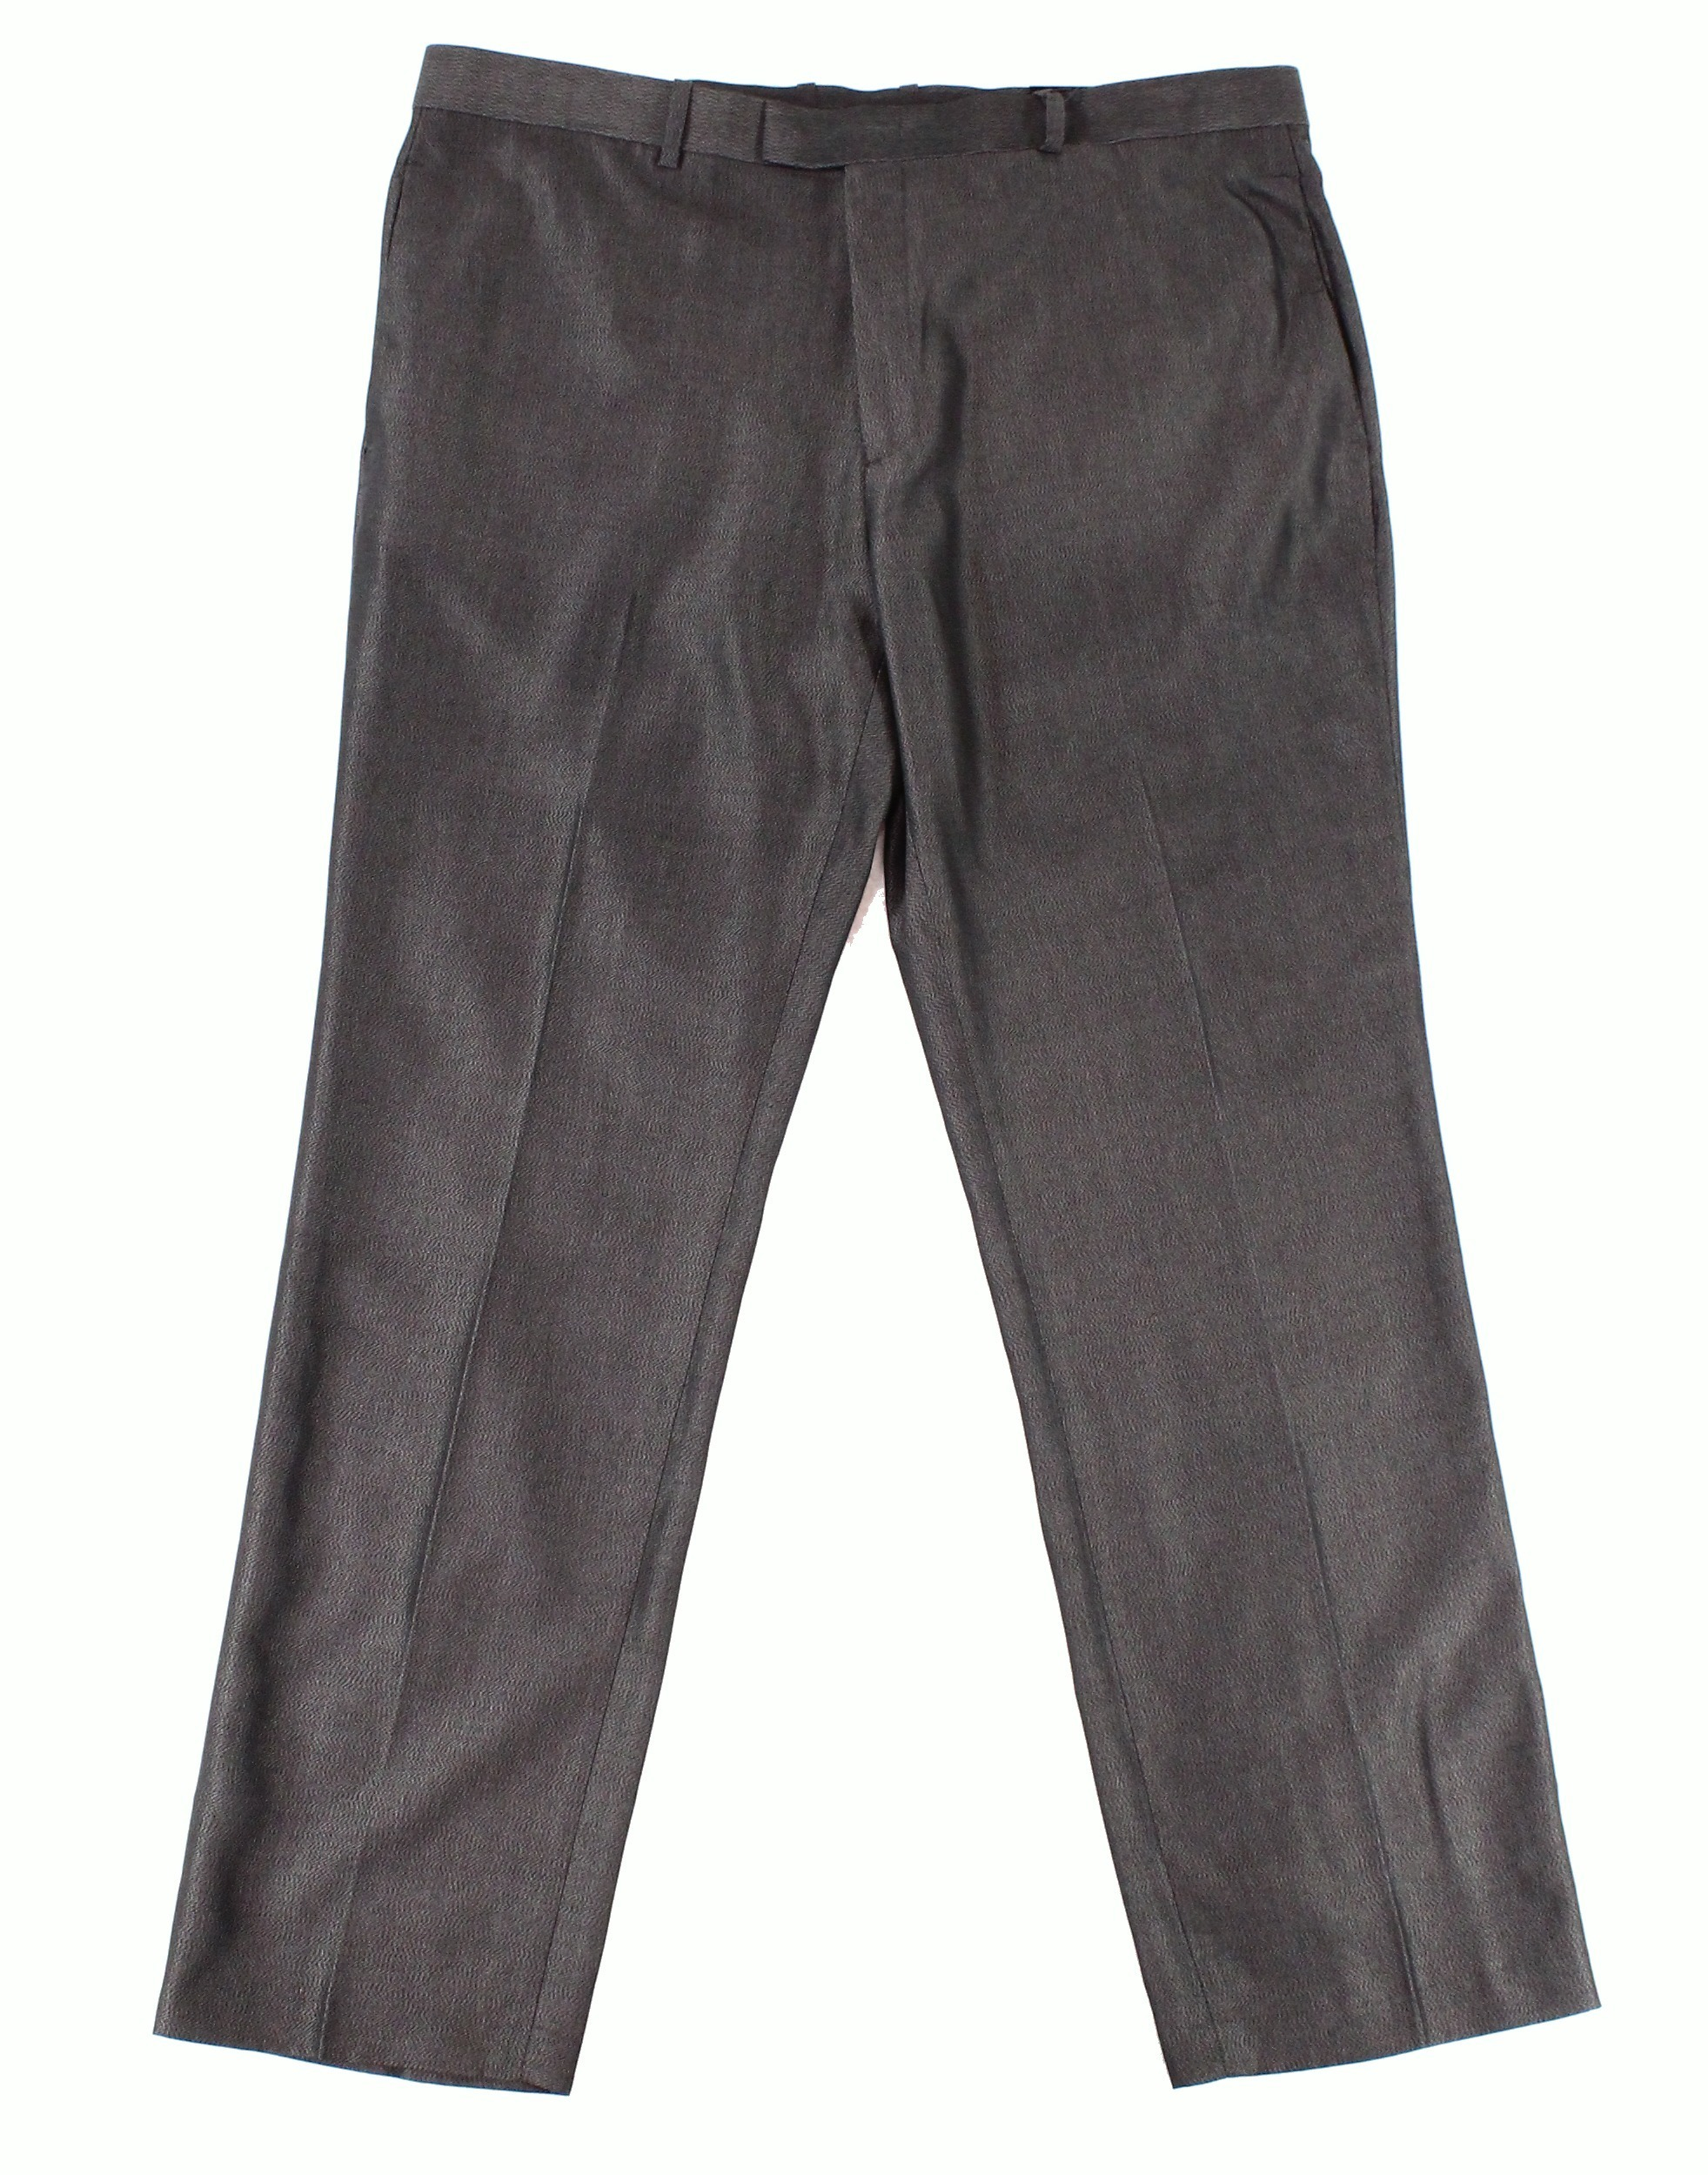 Alfani NEW Black Mens Size 34x29 Embossed Dress Flat Front Pants